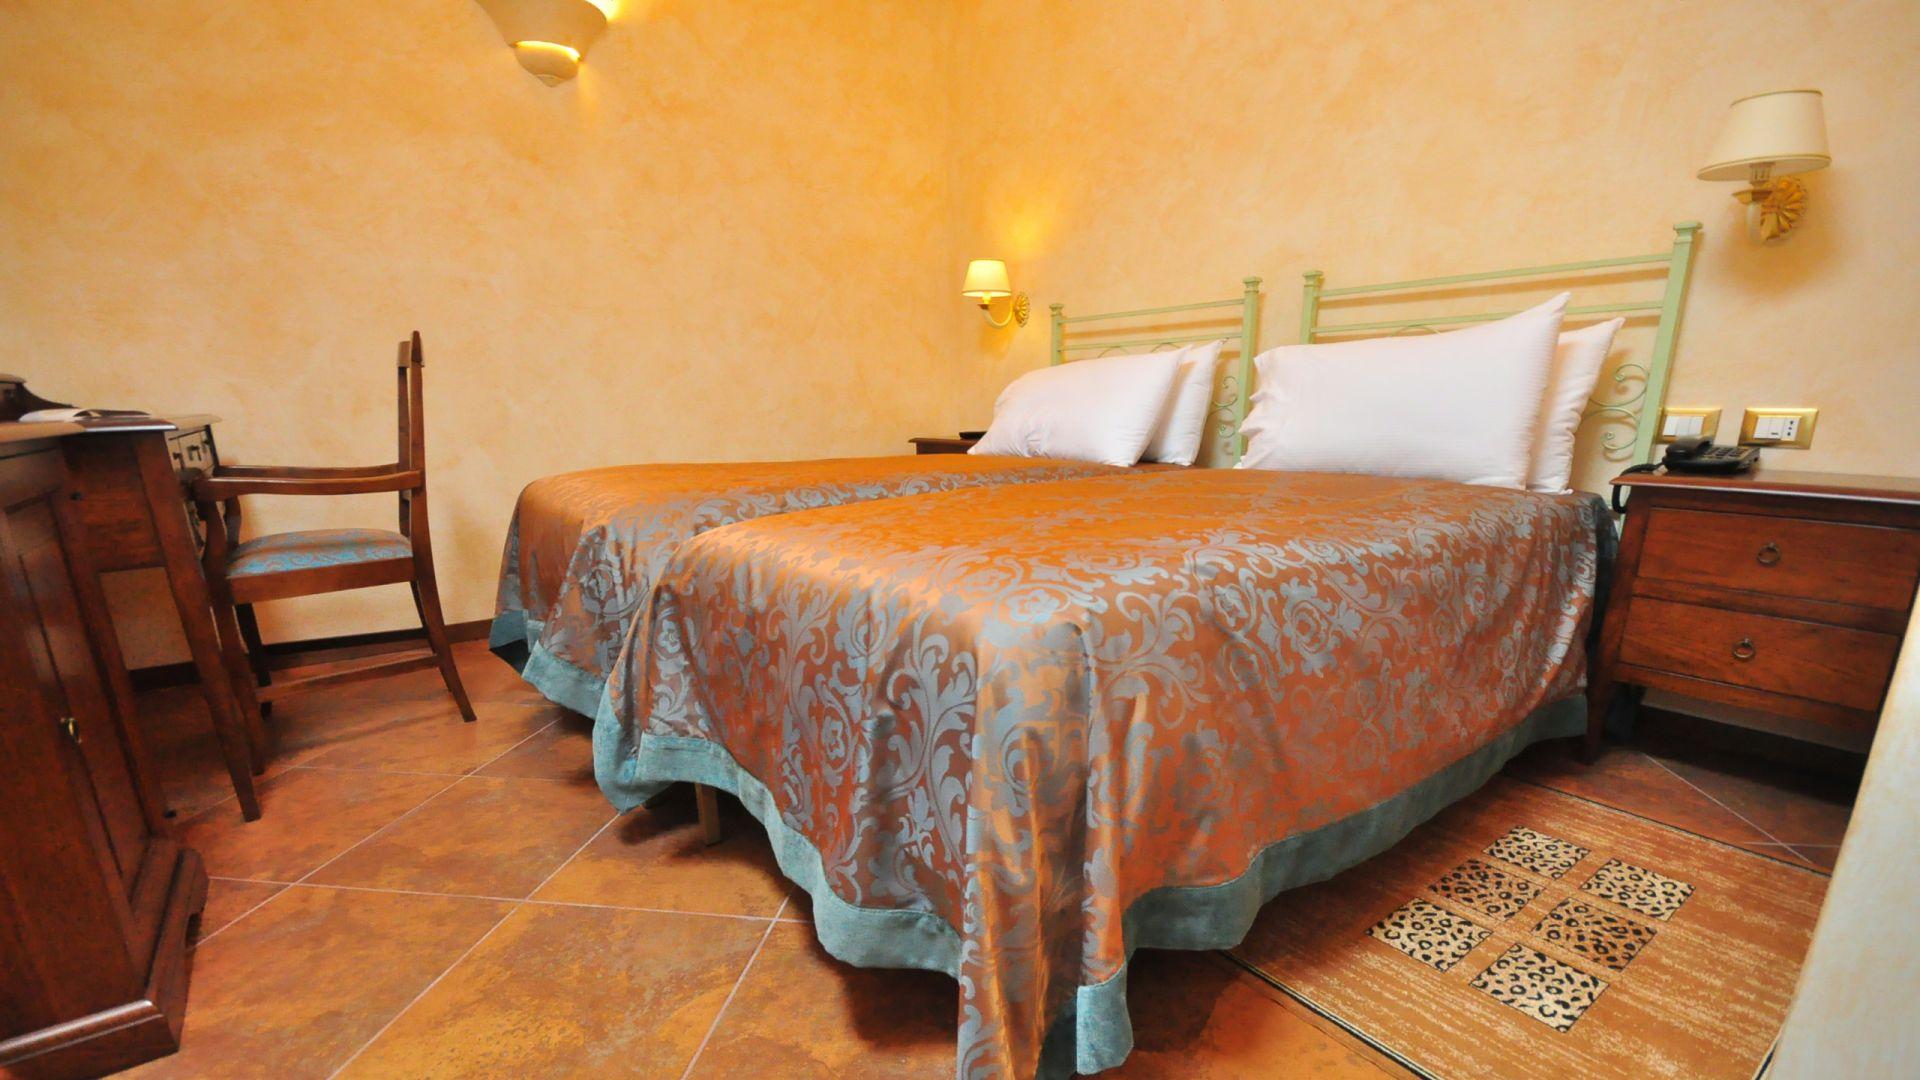 oc-casali-rome-rooms-10